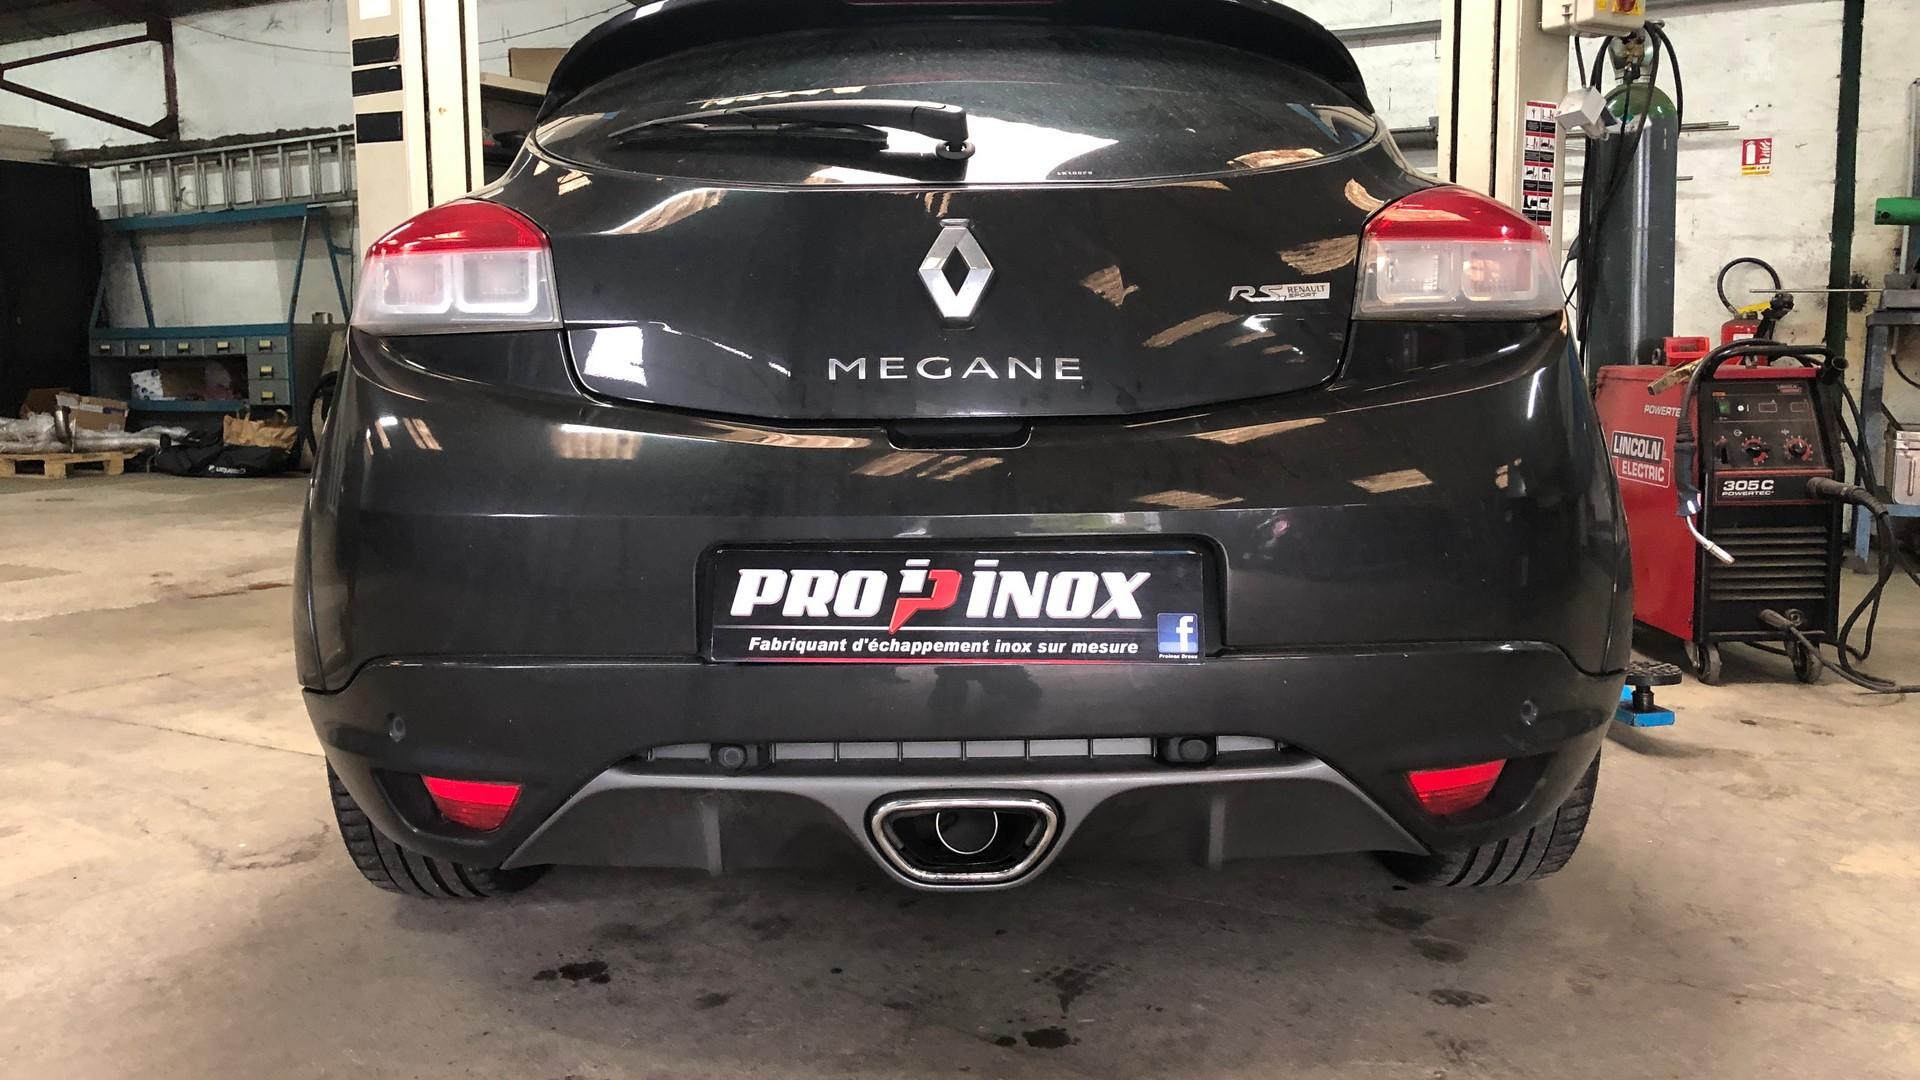 Échappement inox Renault Megane 3 RS